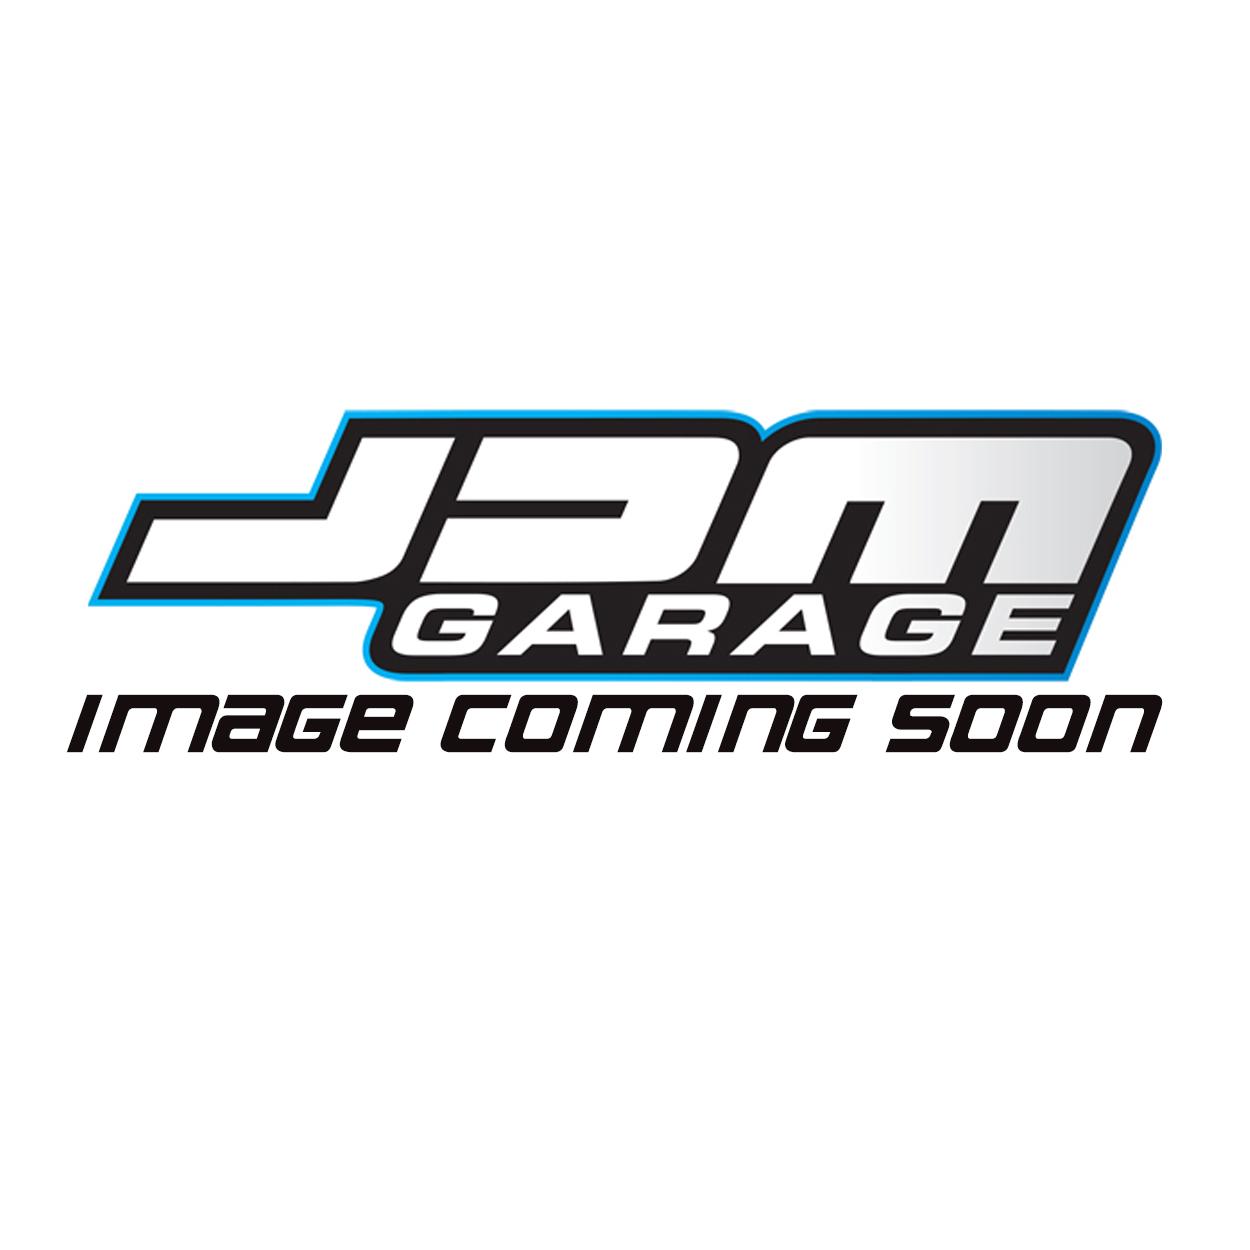 Toyota Soarer/Aristo Rear Toe Rods Suspension Arms